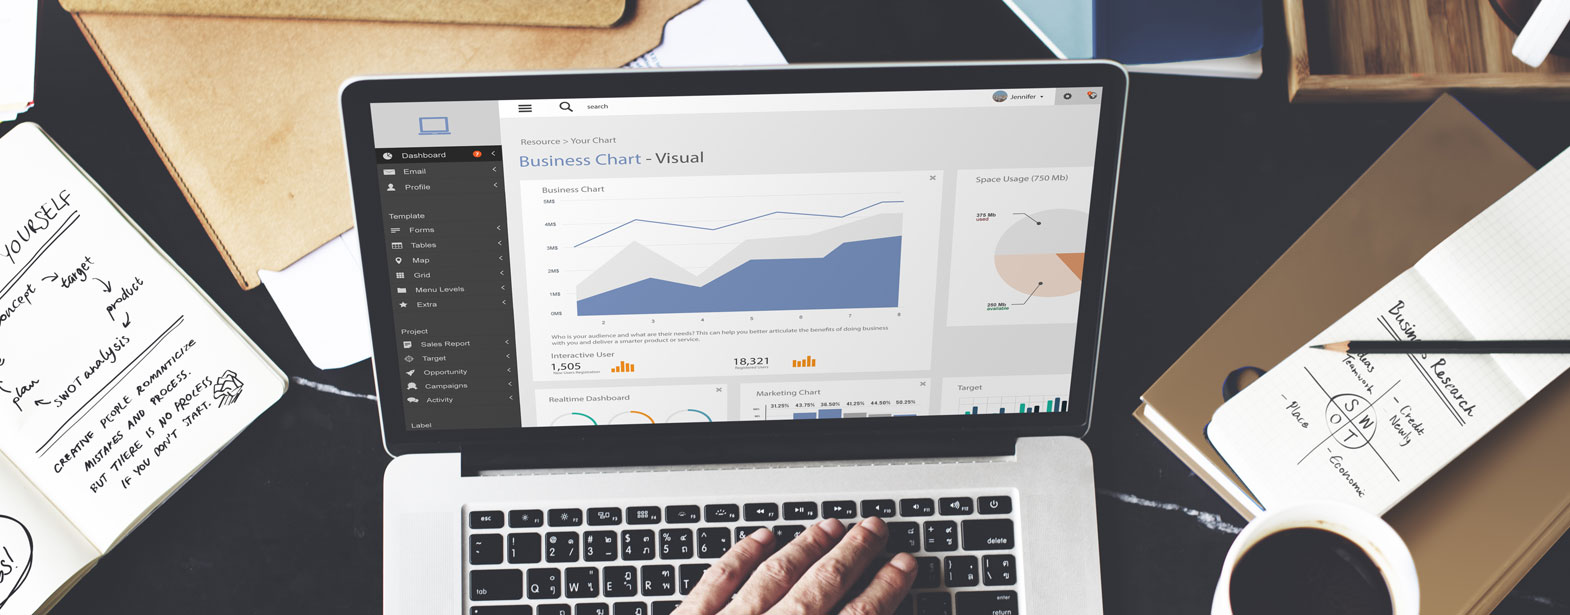 digital-marketing-ebook.jpg